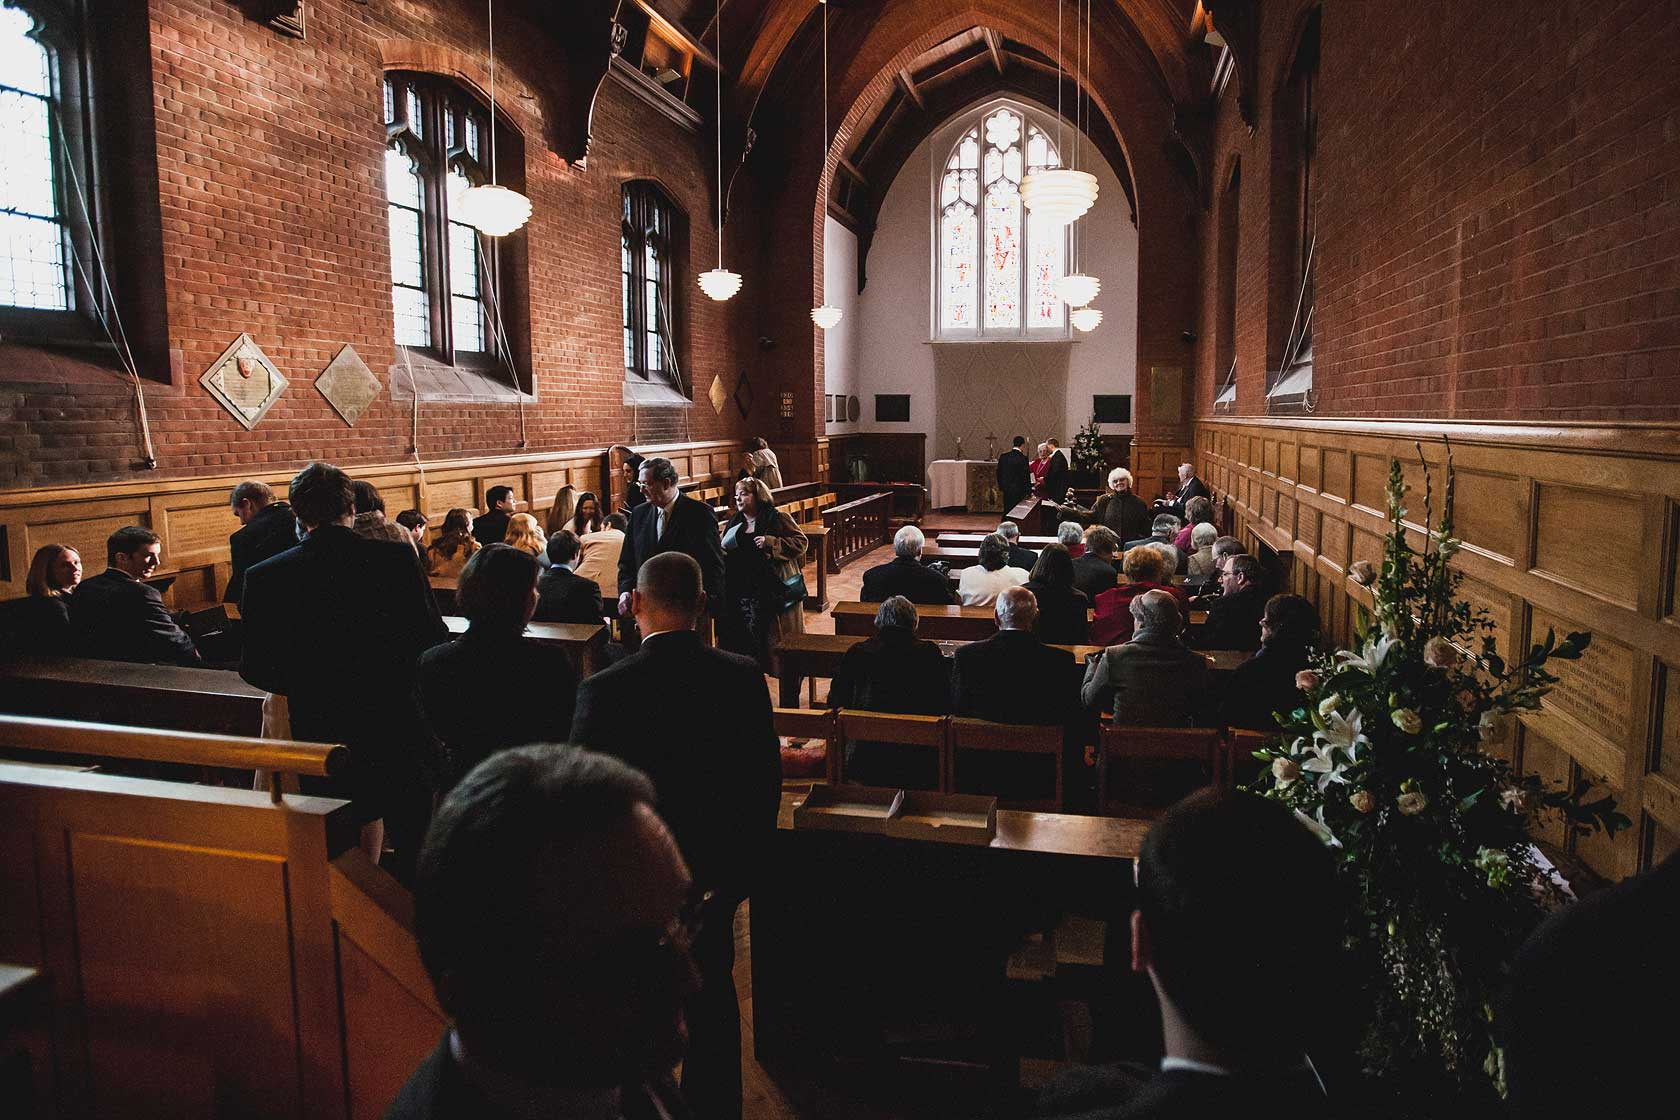 Wedding Photographer at Girton College